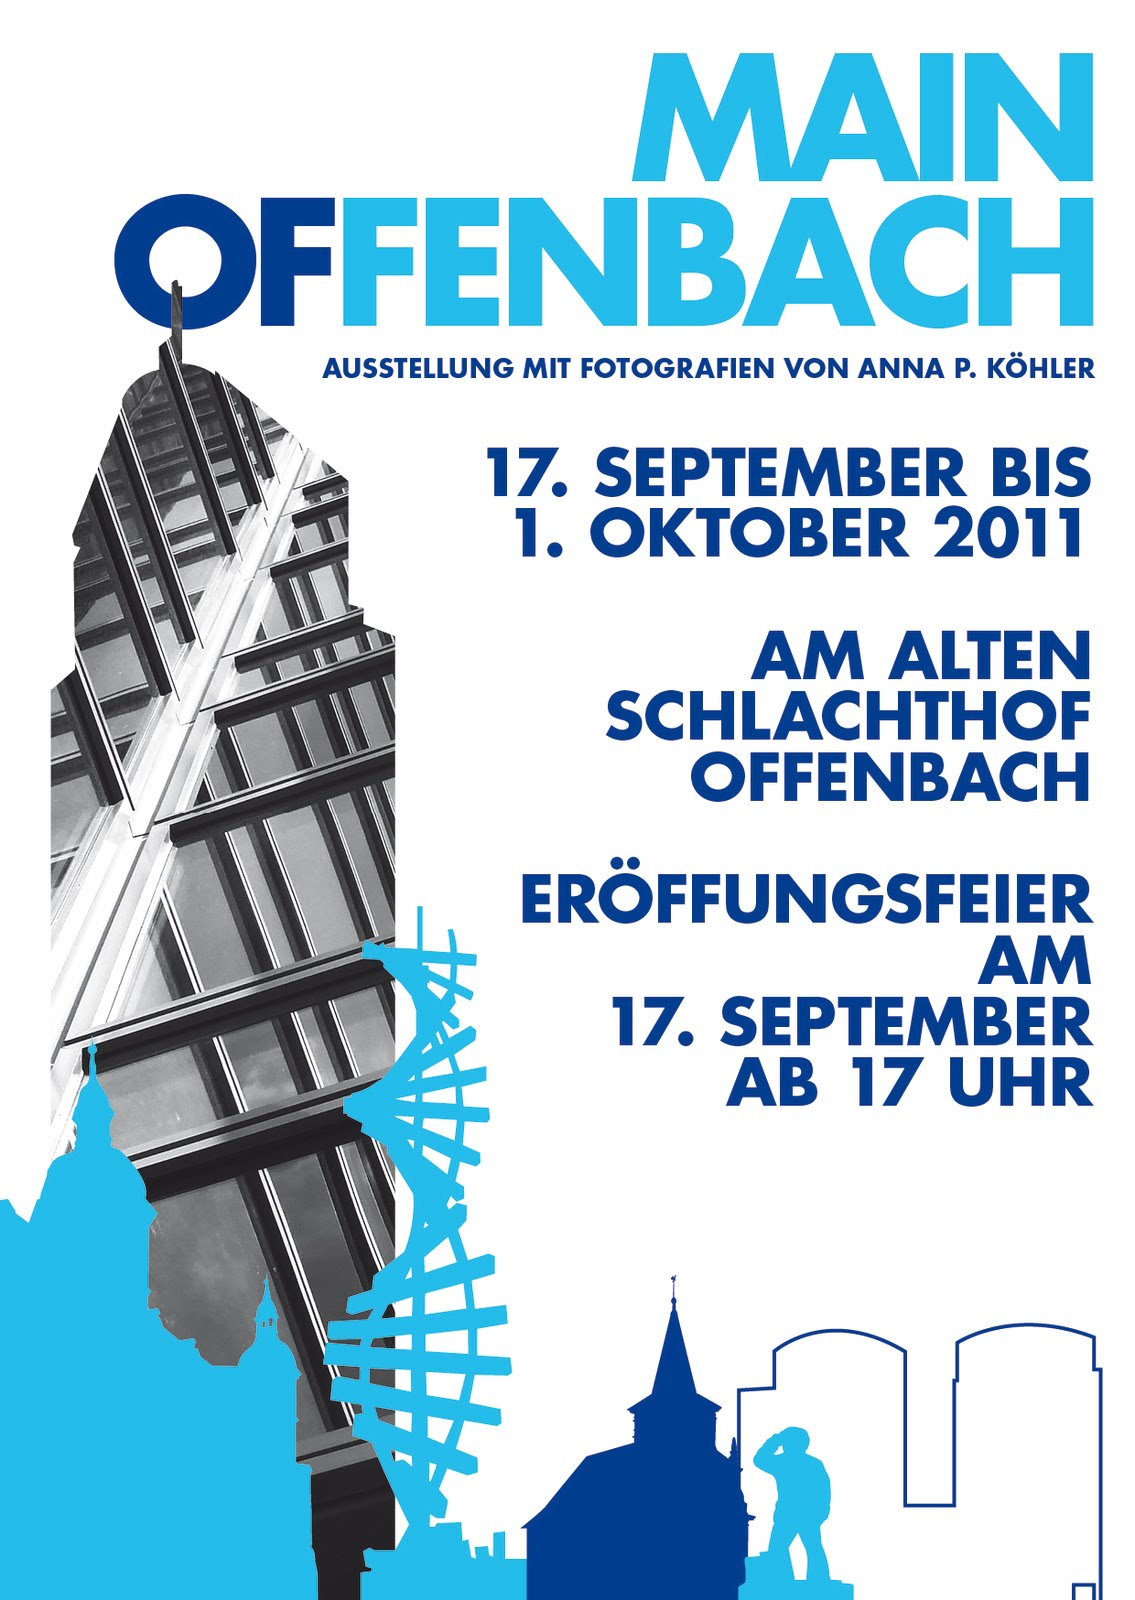 Main offenbach blog august 2011 for Ui offenbach